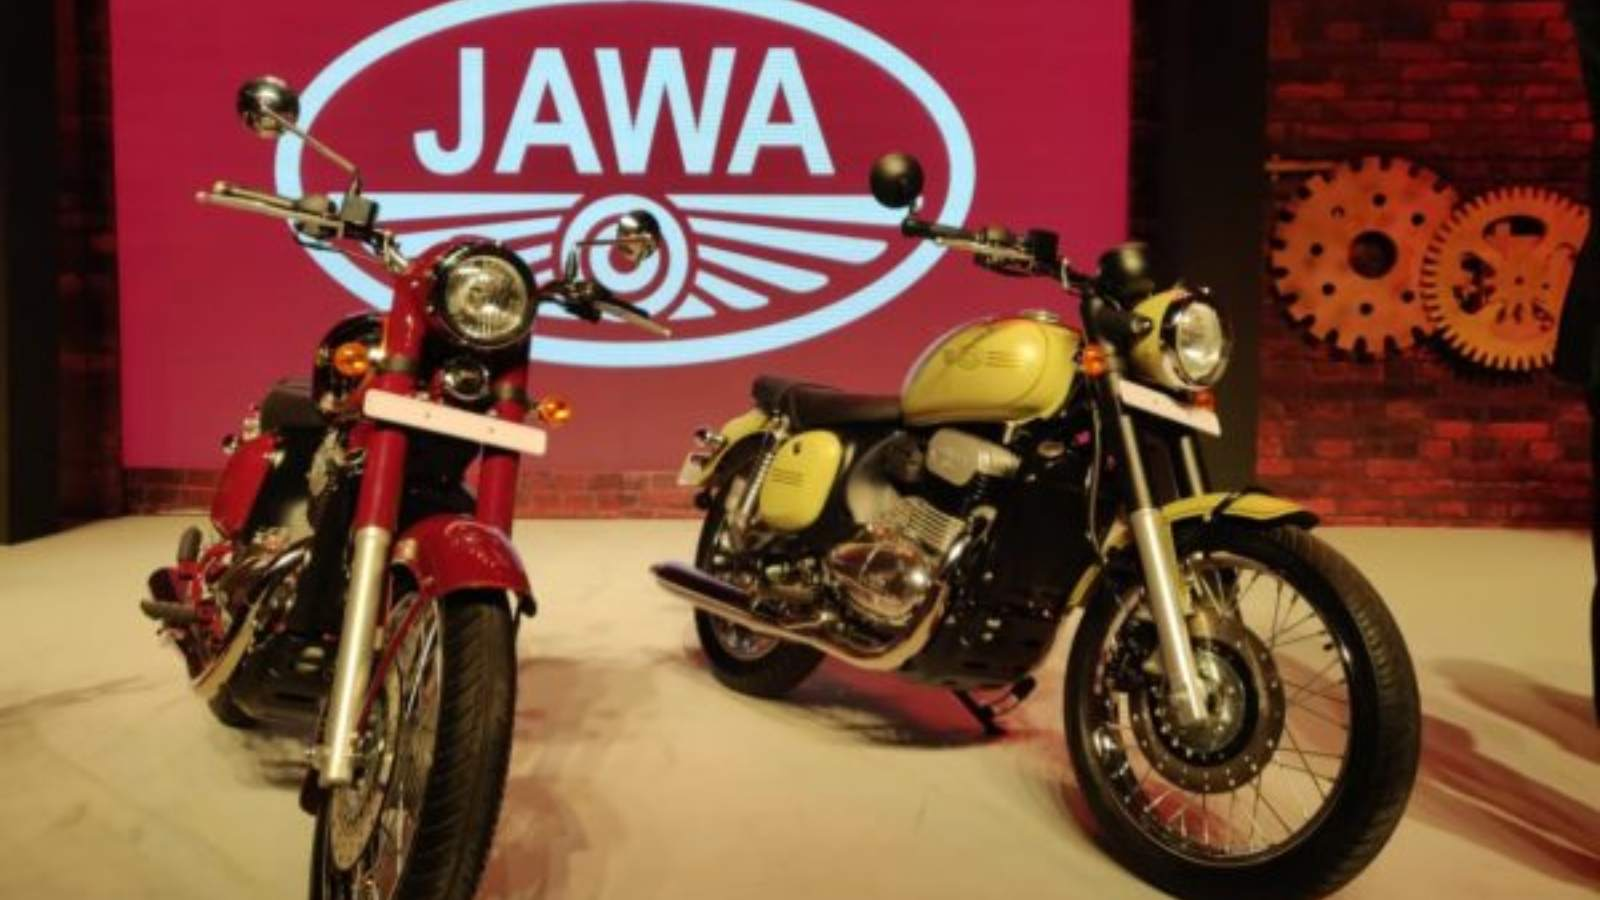 Jawa Motorcycles News, Launches, Reviews From India - Motoroids